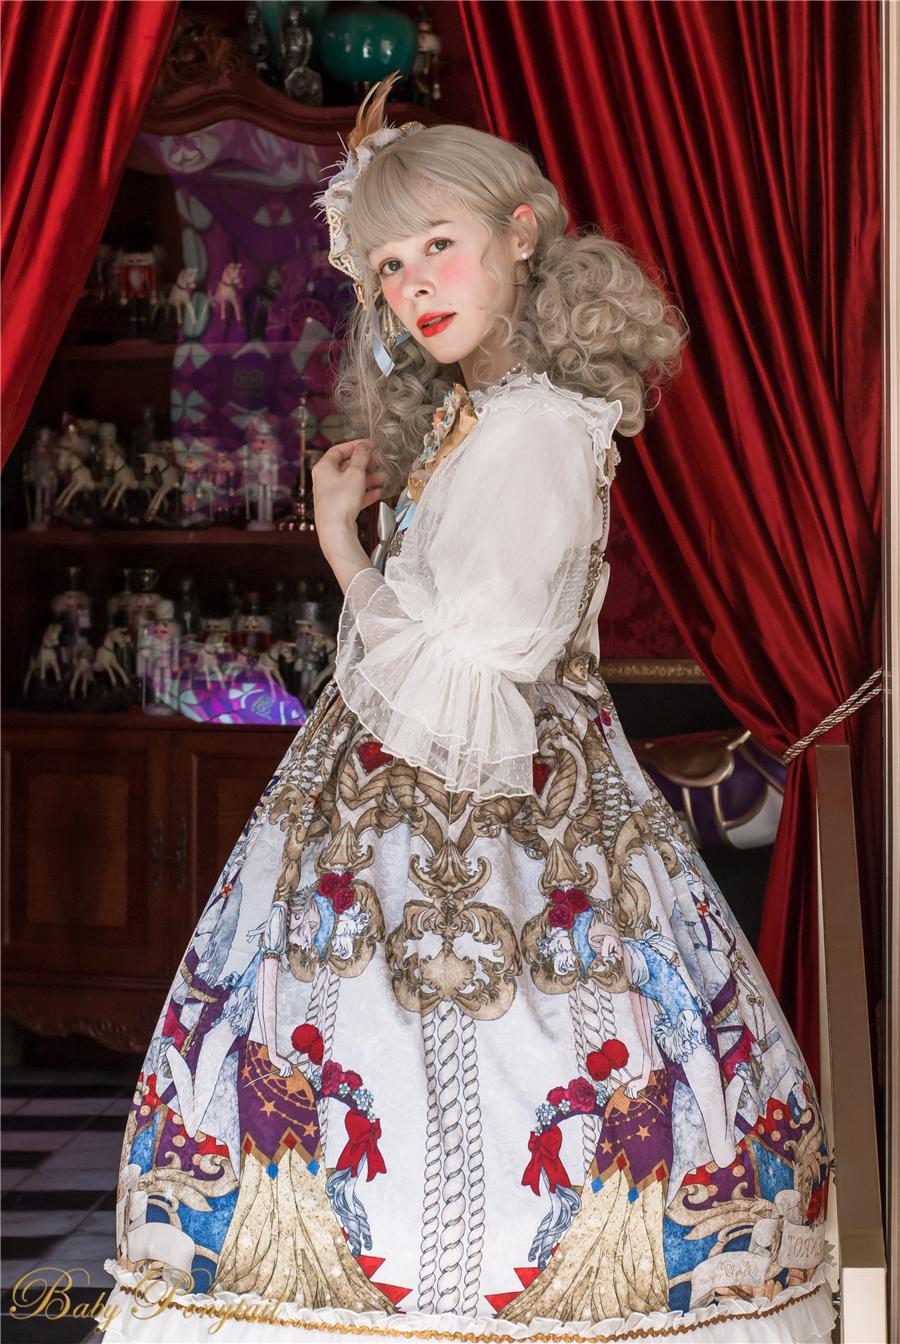 Baby Ponytail_Circus Princess_Silver JSK_Claudia26.jpg